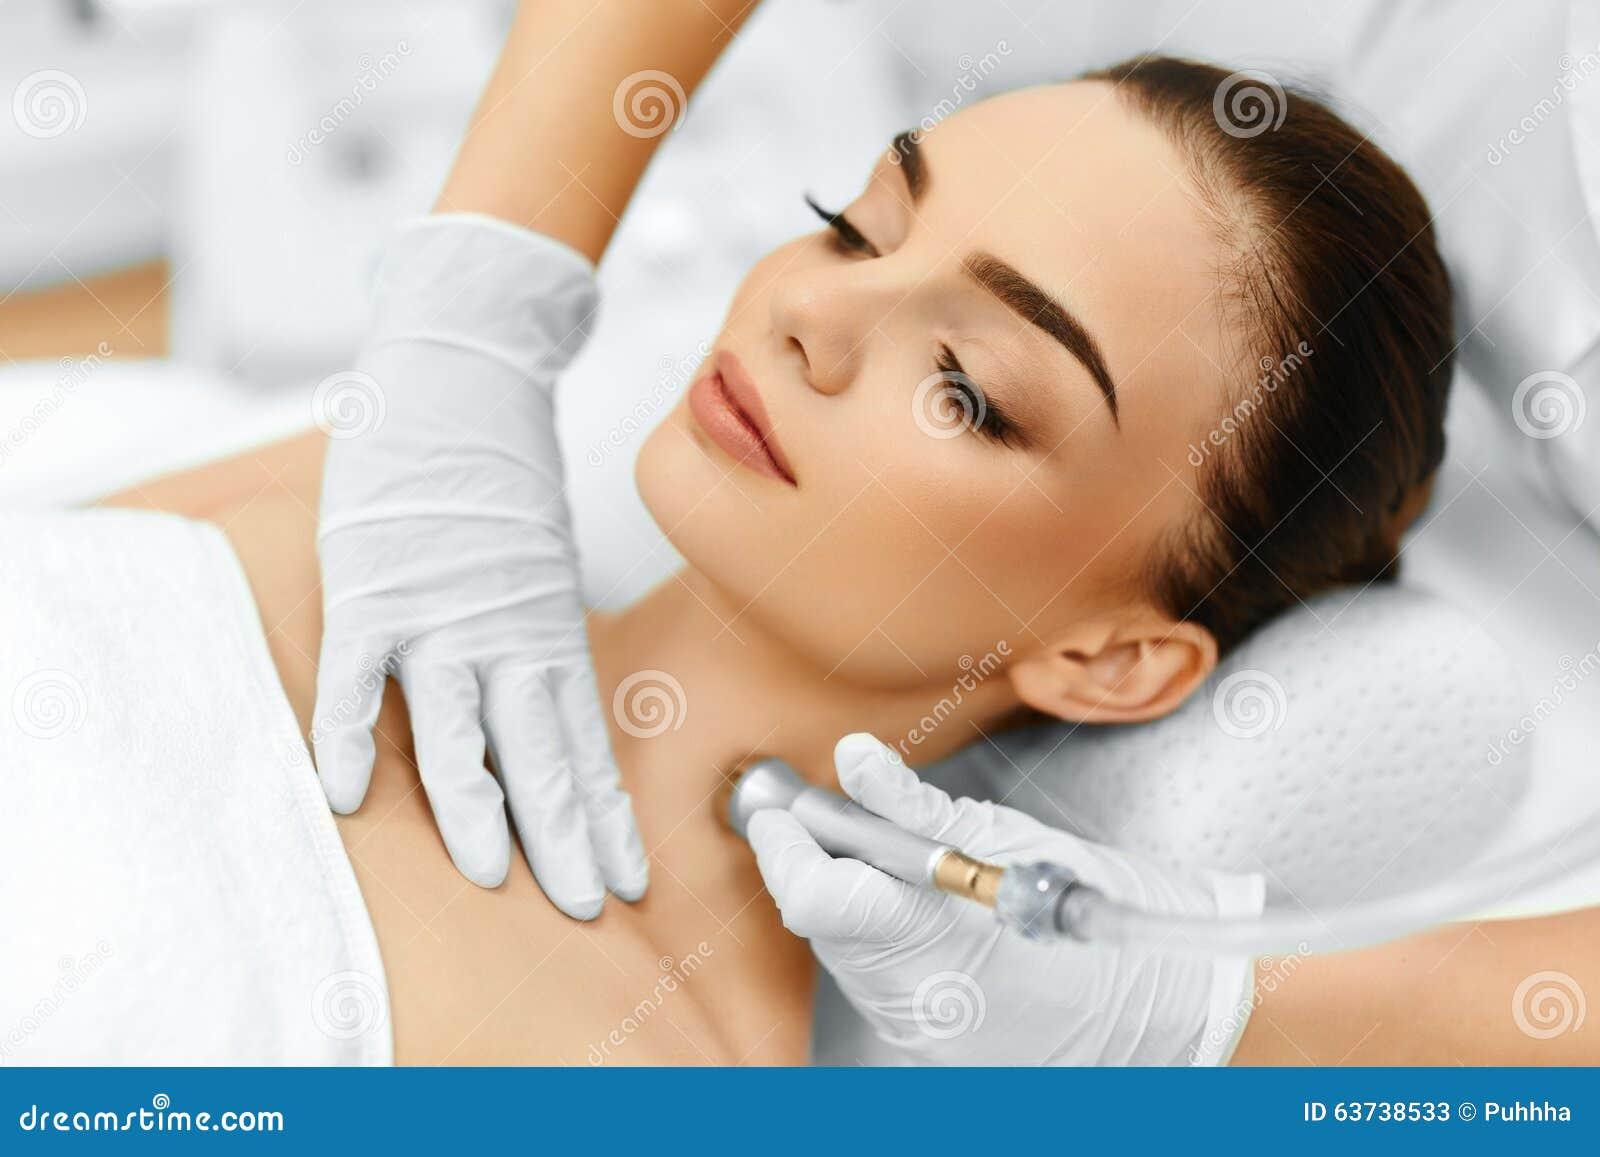 Face skin care diamond microdermabrasion peeling for Skins beauty salon